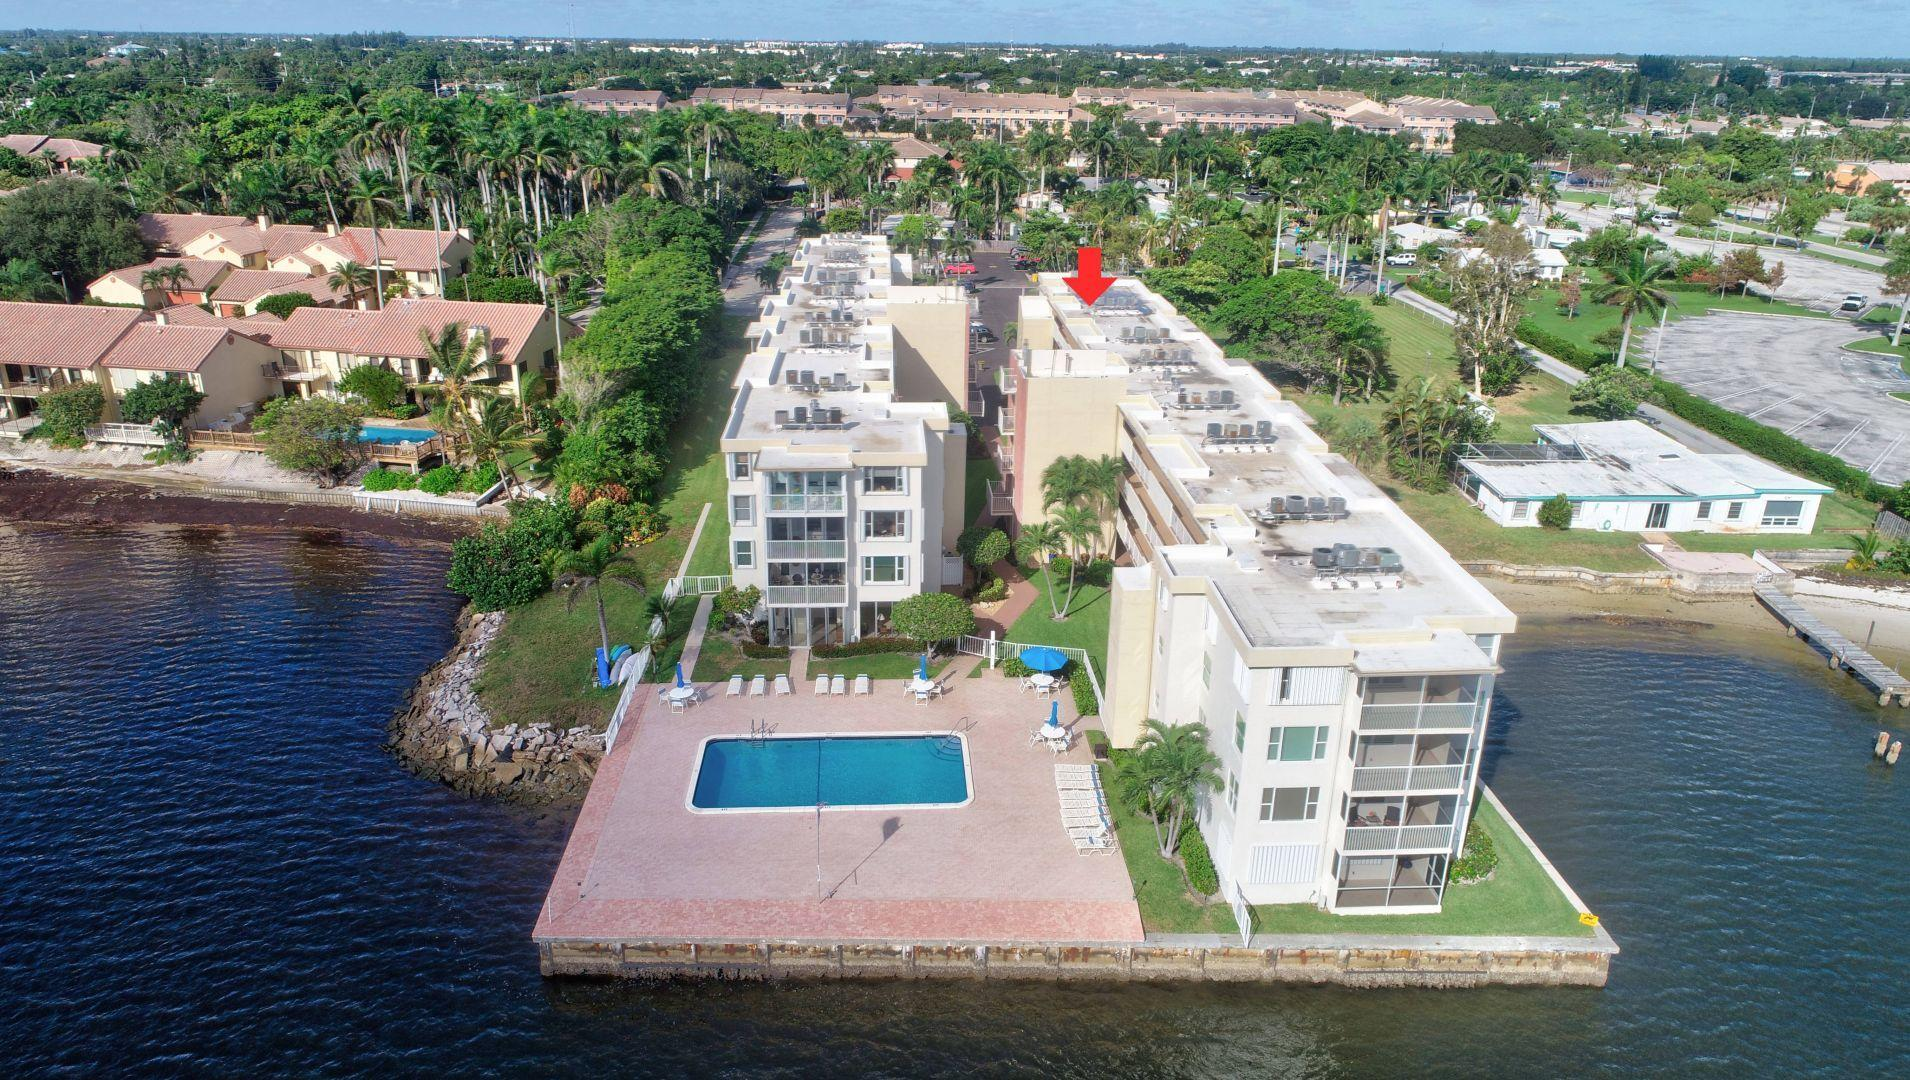 1820 New Palm Way, Boynton Beach, FL 33435